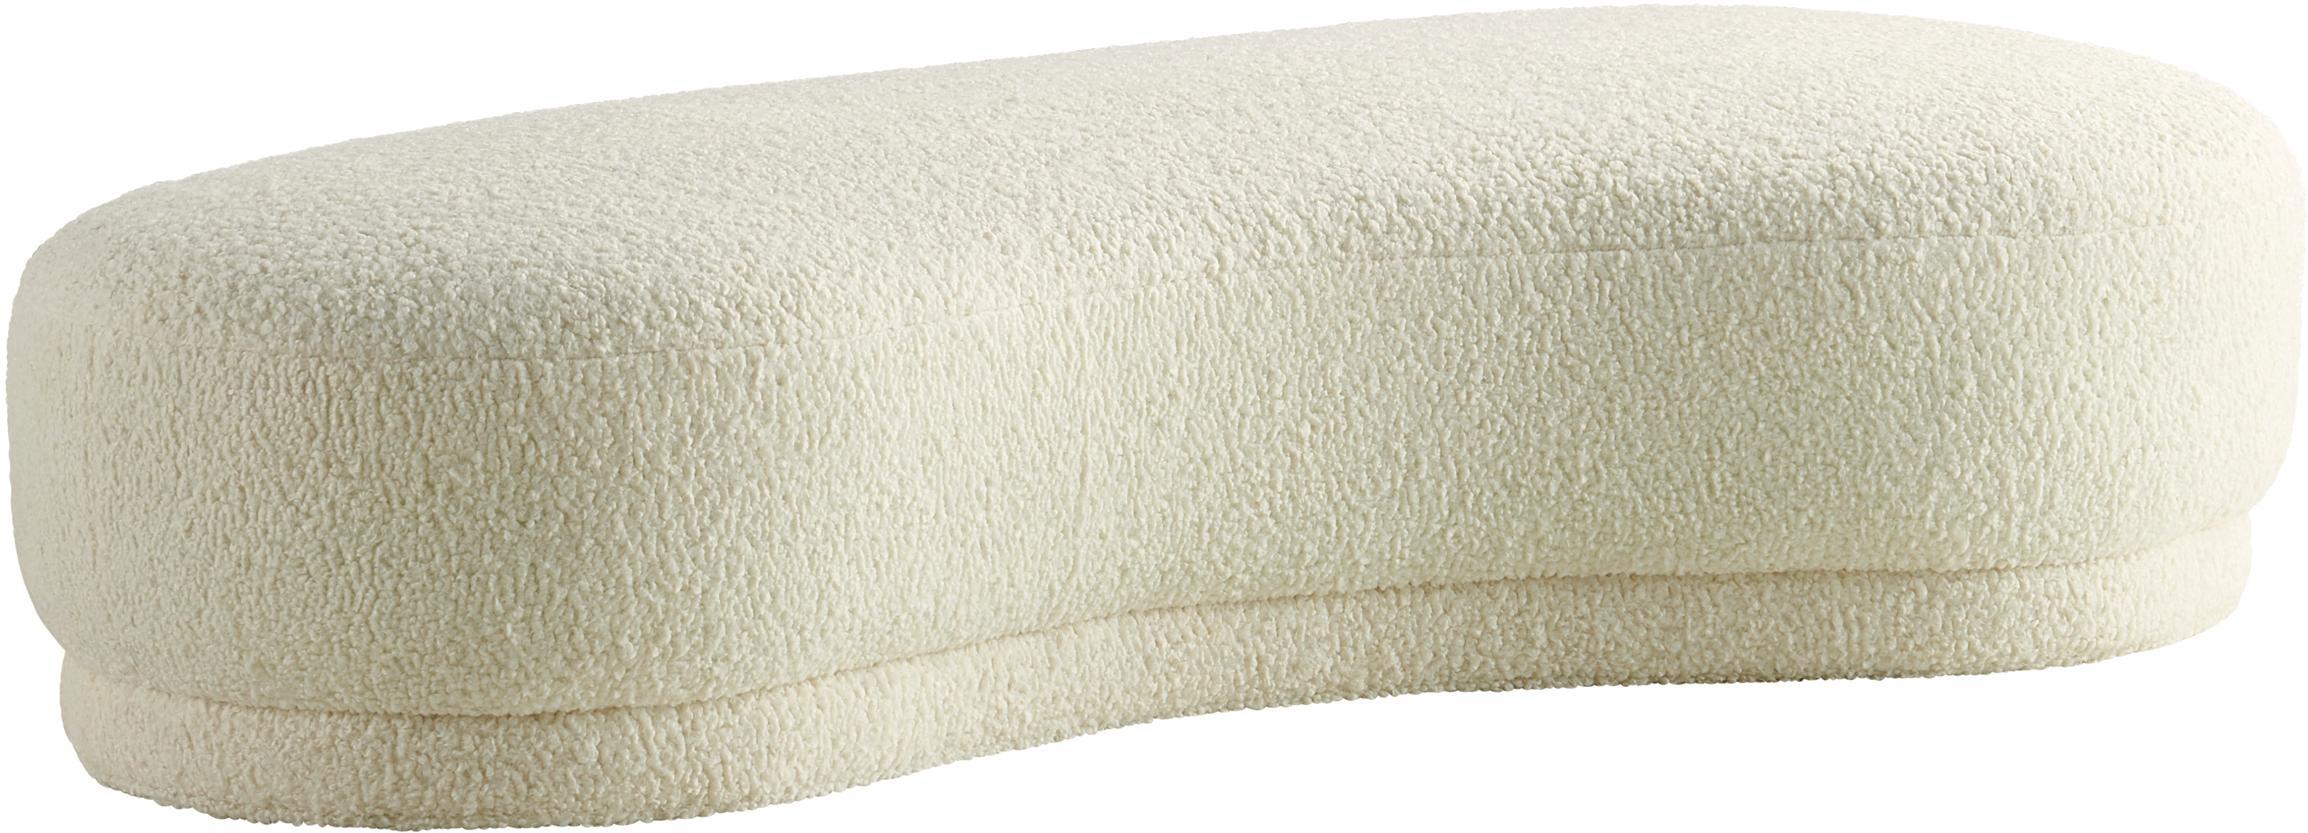 Teddy bank Austin, Bekleding: polyester, Frame: grenenhout, Crèmewit, 160 x 36 cm